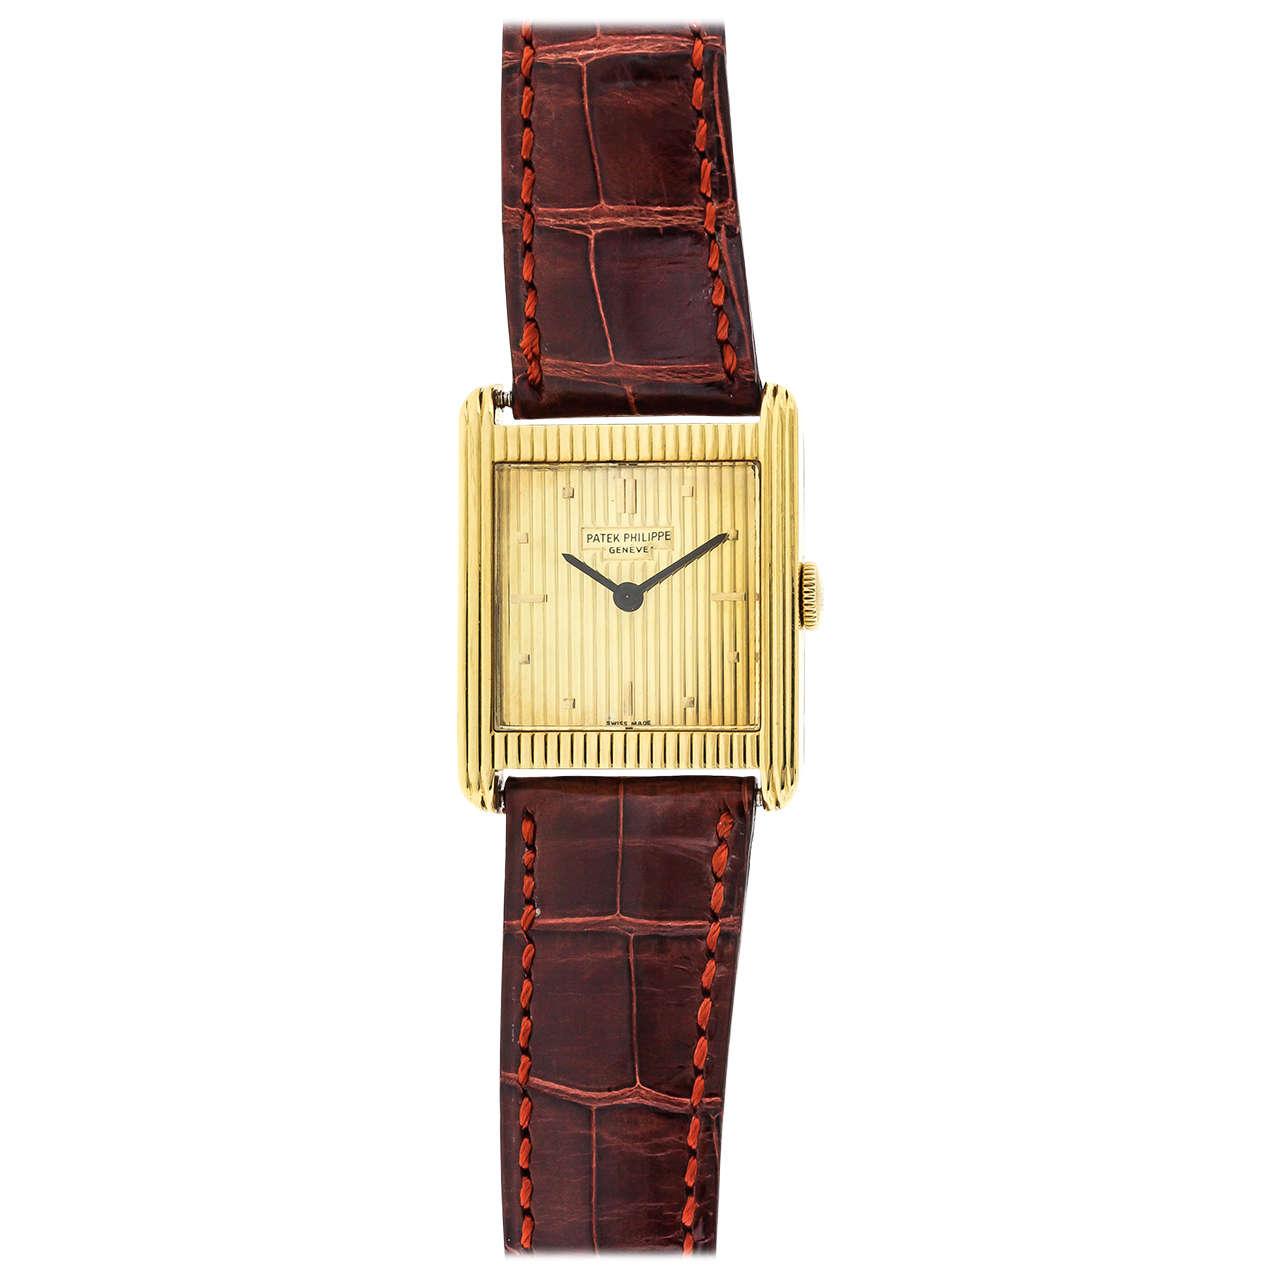 Patek Philippe Yellow Gold Manual Wind Wristwatch Ref 3475